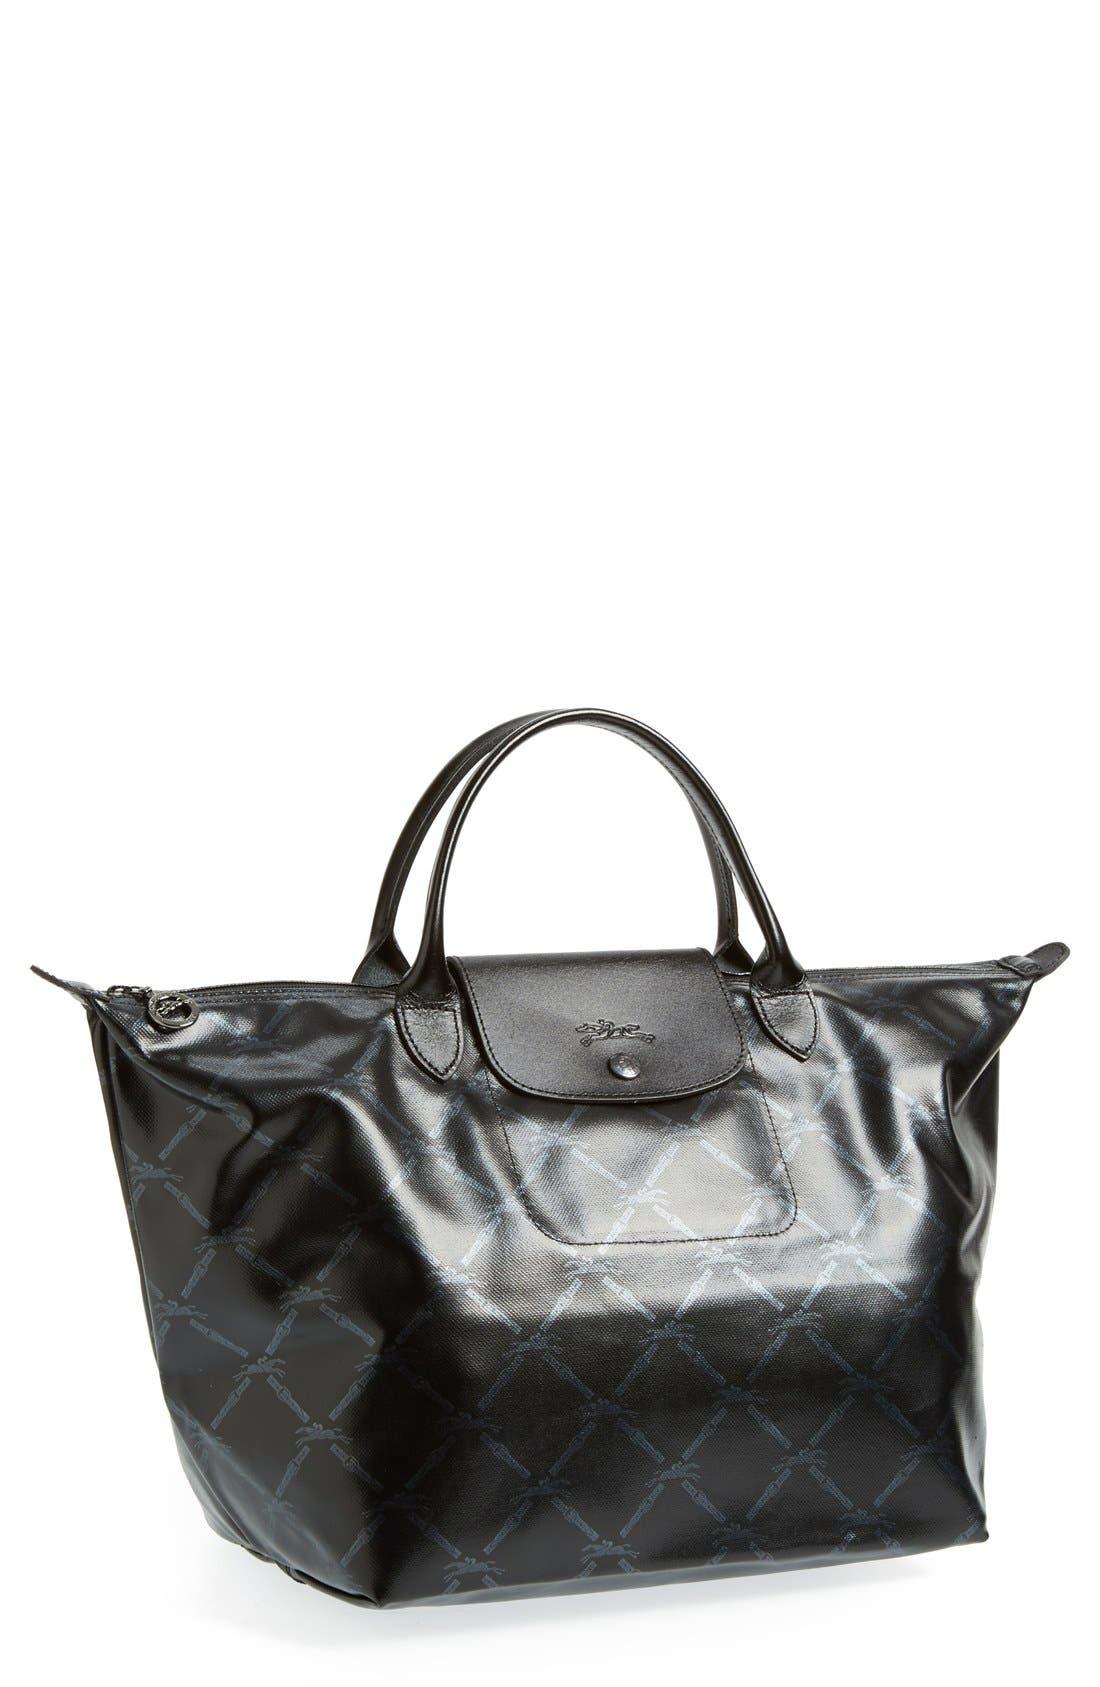 Alternate Image 1 Selected - Longchamp 'LM Metal' Handbag